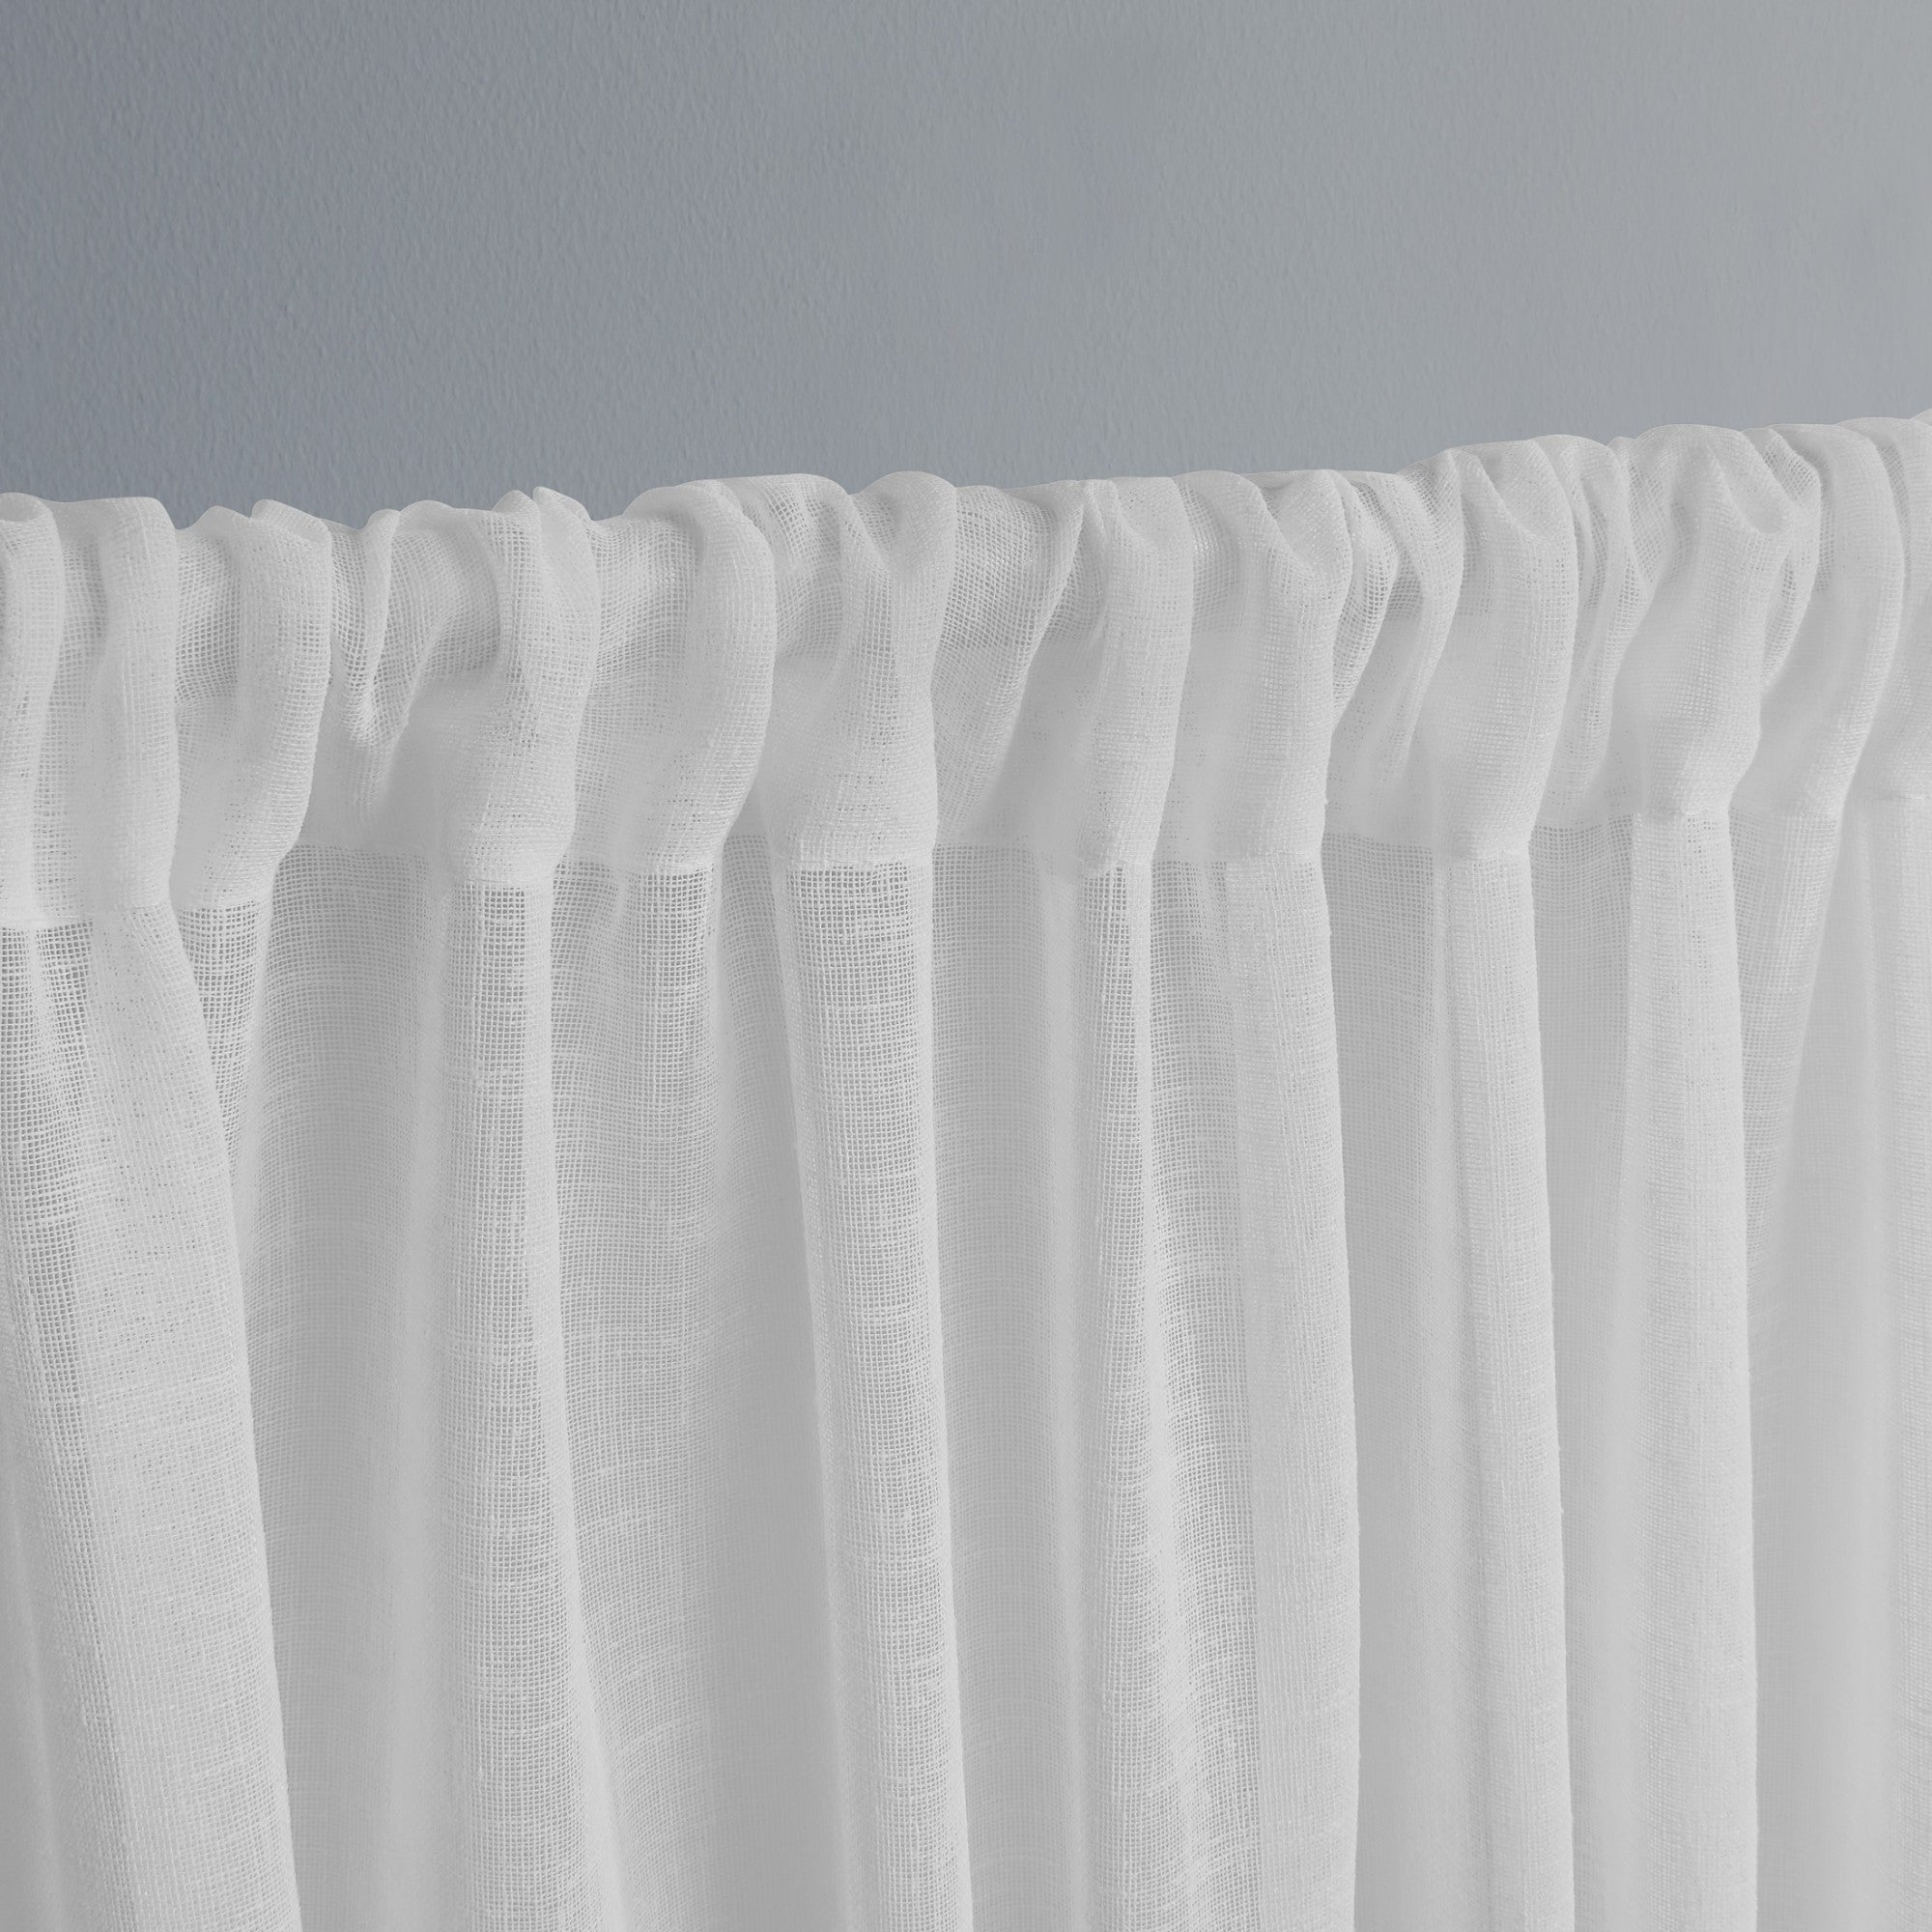 Newest Belgian Sheer Window Curtain Panel Pairs With Rod Pocket Regarding Ati Home Belgian Sheer Window Curtain Panel Pair With Rod Pocket (View 14 of 20)